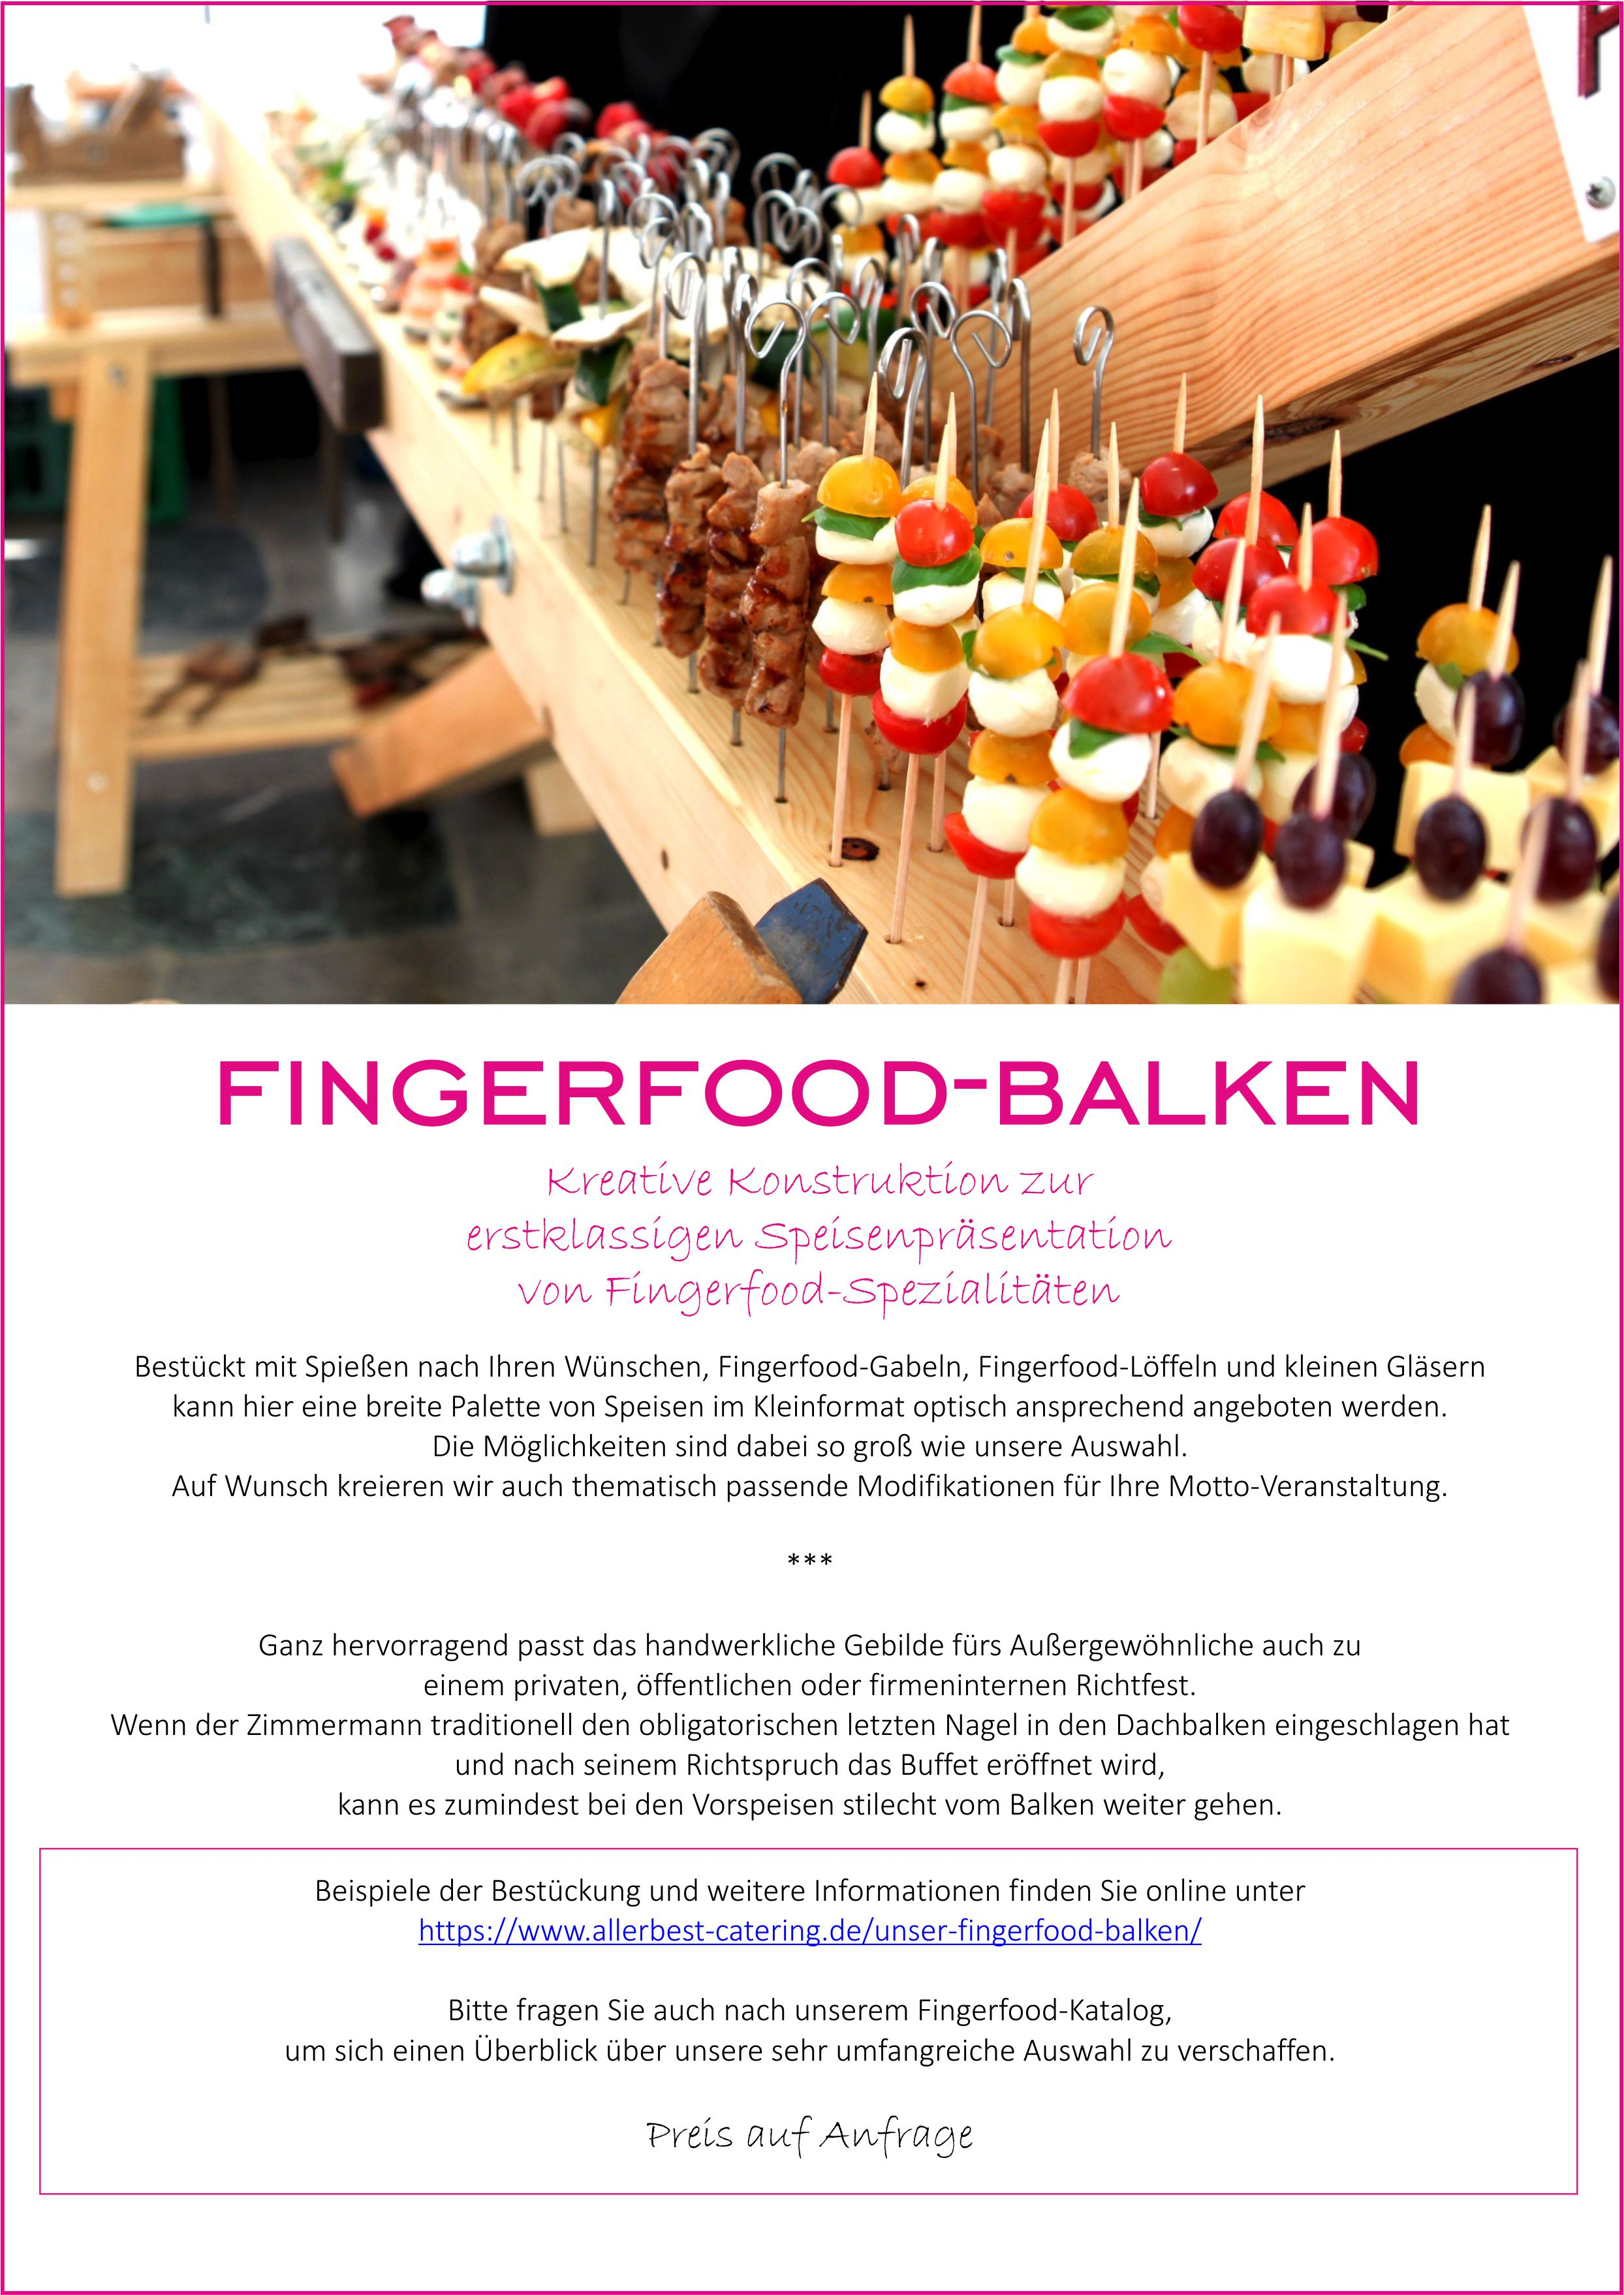 Titelblatt Fingerfood-Balken 2018